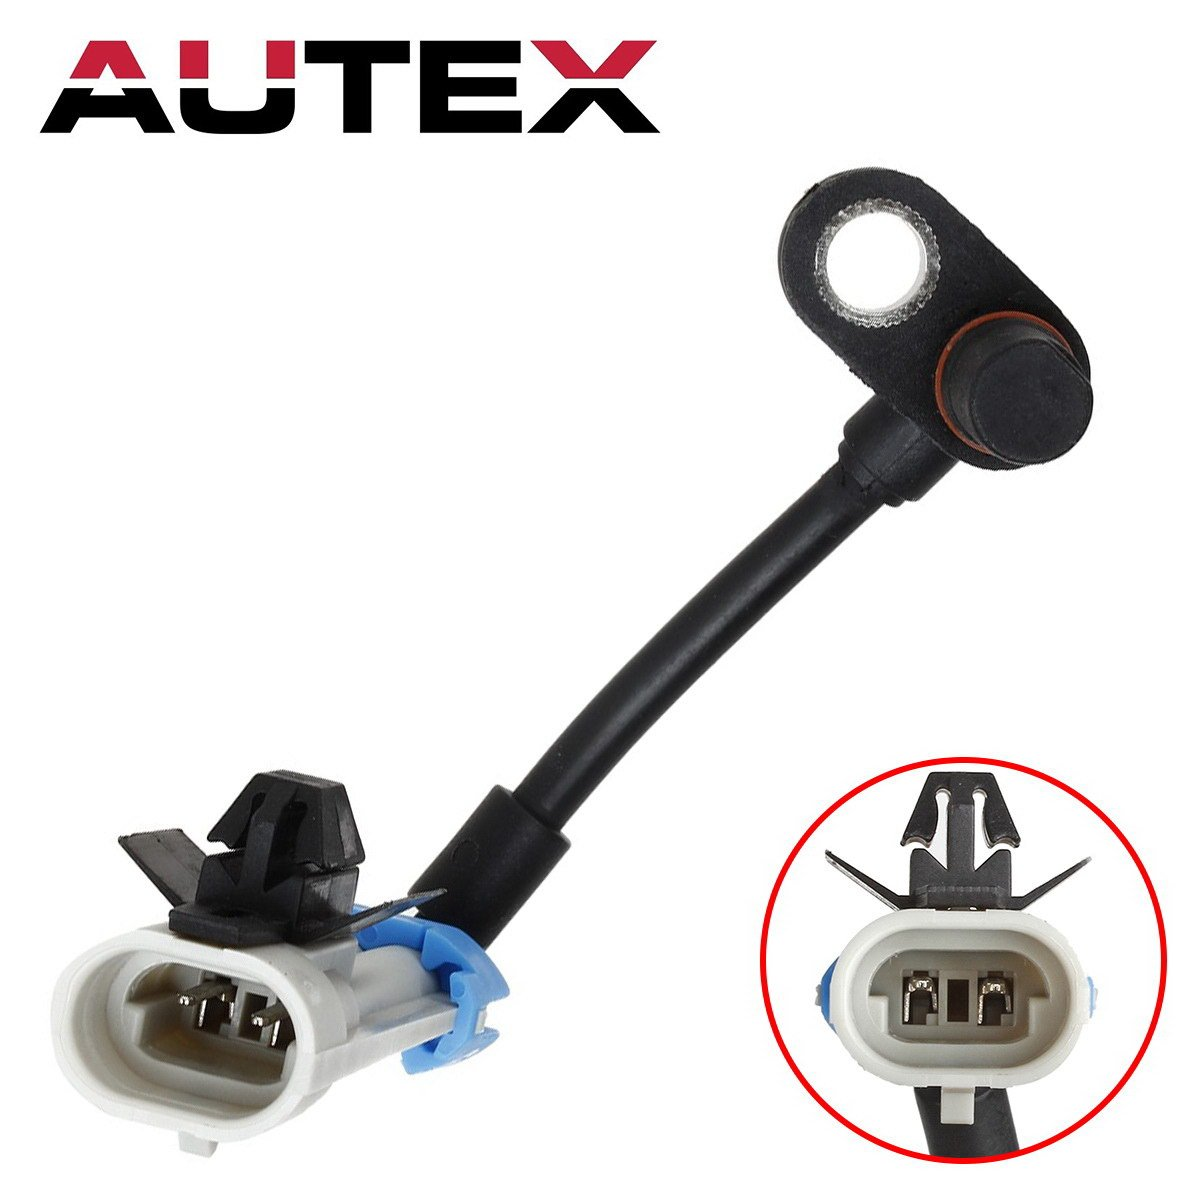 AUTEX ABS Wheel Speed Sensor Front Left/Right 96626078 ALS1748 compatible with 2007-2009 Chevrolet Equinox/2007-2009 Pontiac Torrent/2008-2010 Saturn Vue/2007-2009 Suzuki XL-7